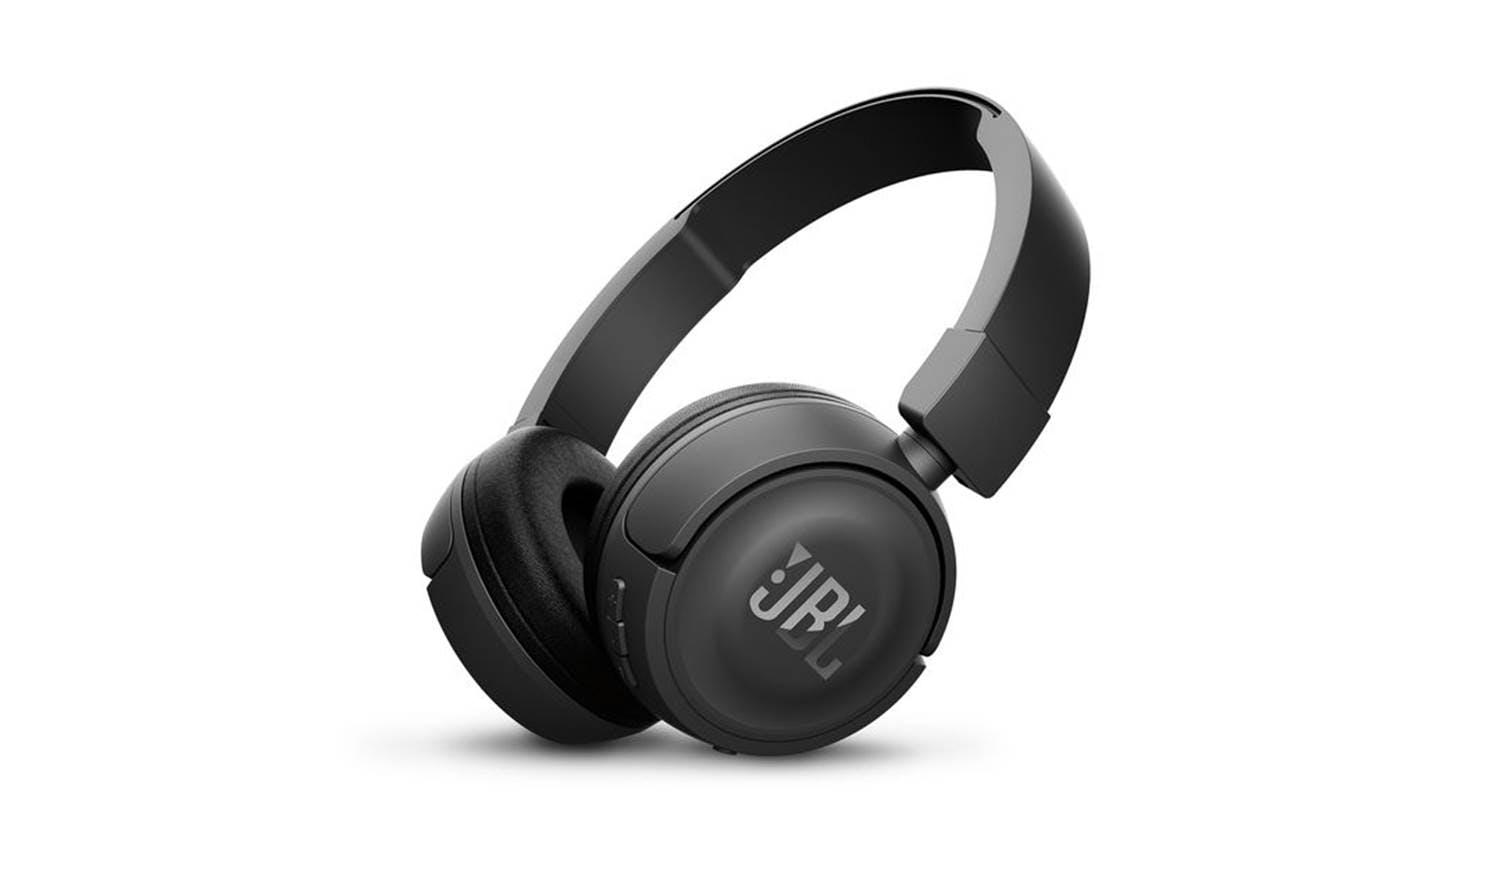 82a635e2b2a JBL T450 Bluetooth On-Ear Headphones - Black | Harvey Norman Singapore